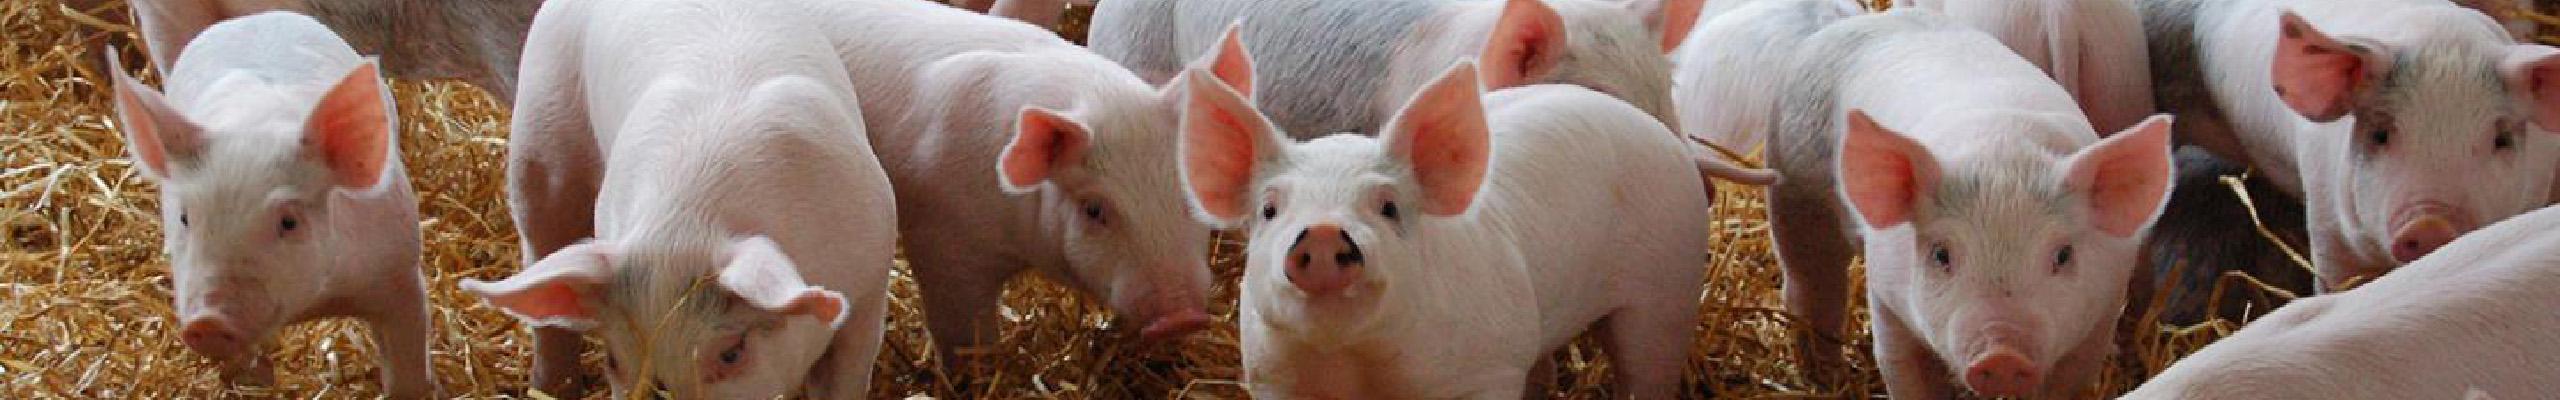 Roadhogs Recruitment Pig Jobs